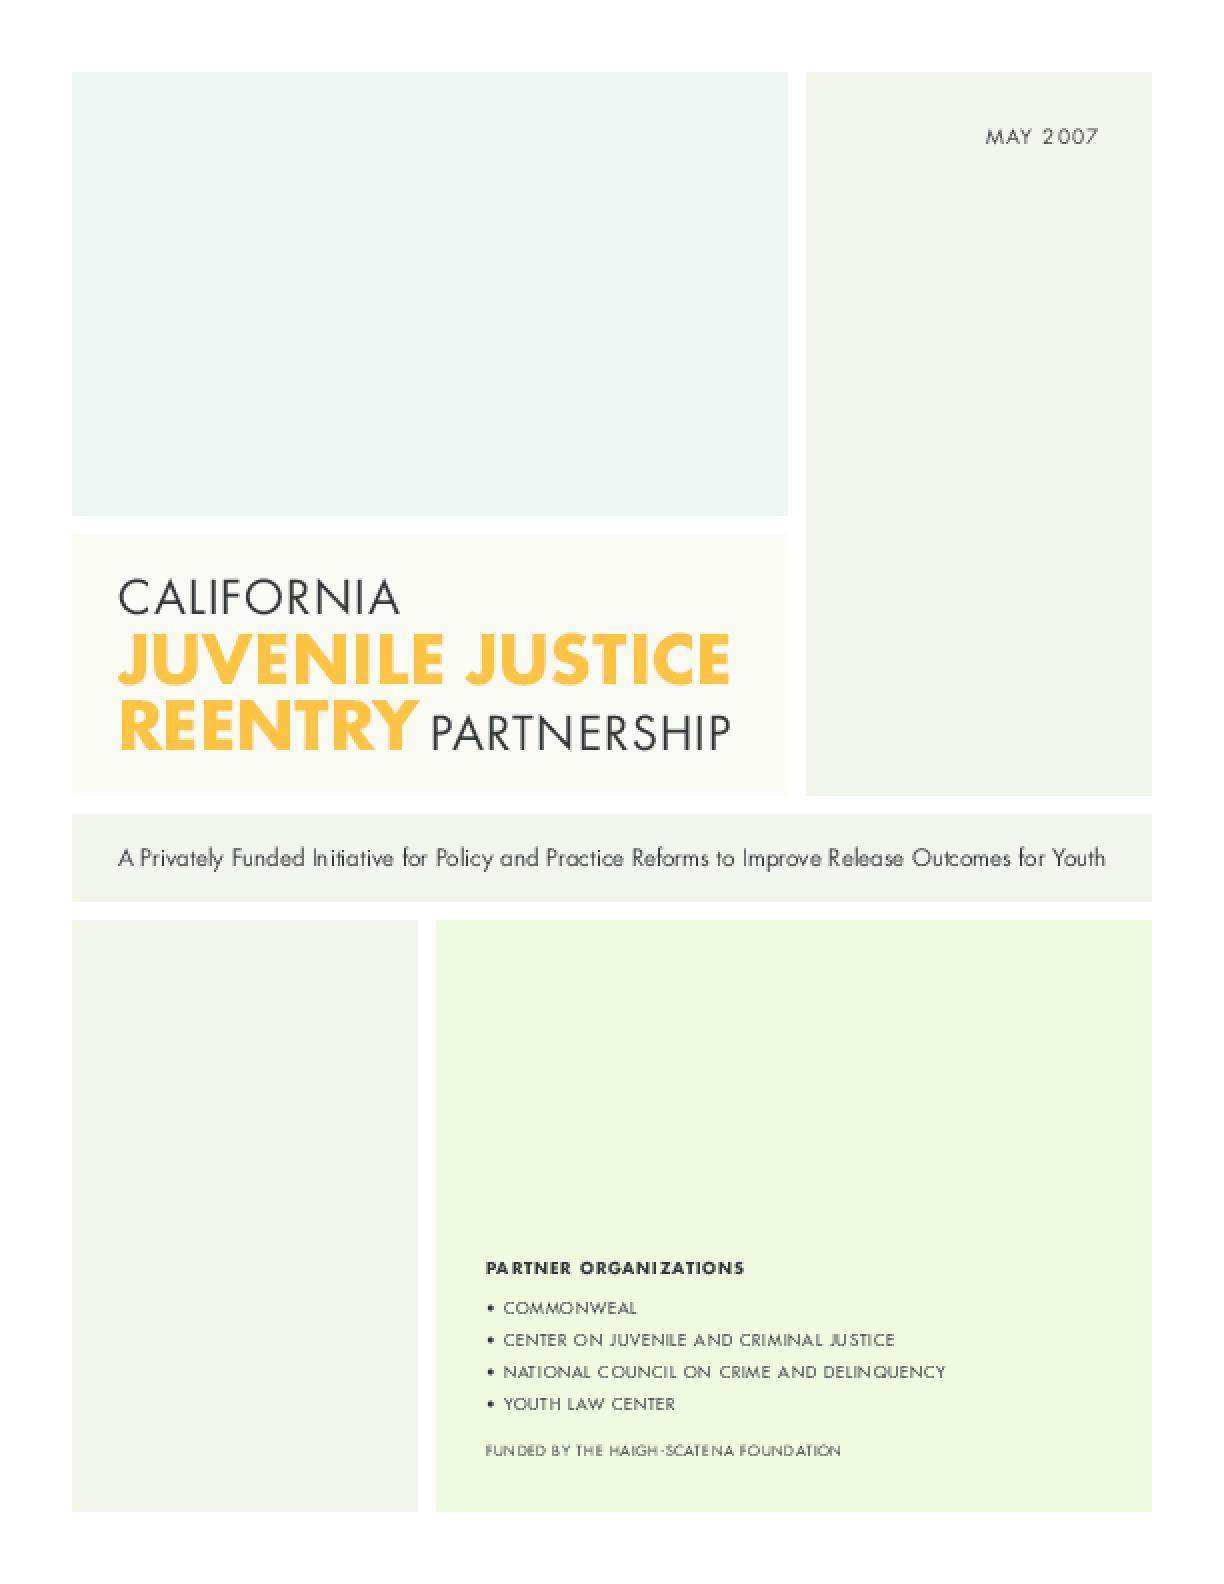 California Juvenile Justice Reentry Partnership